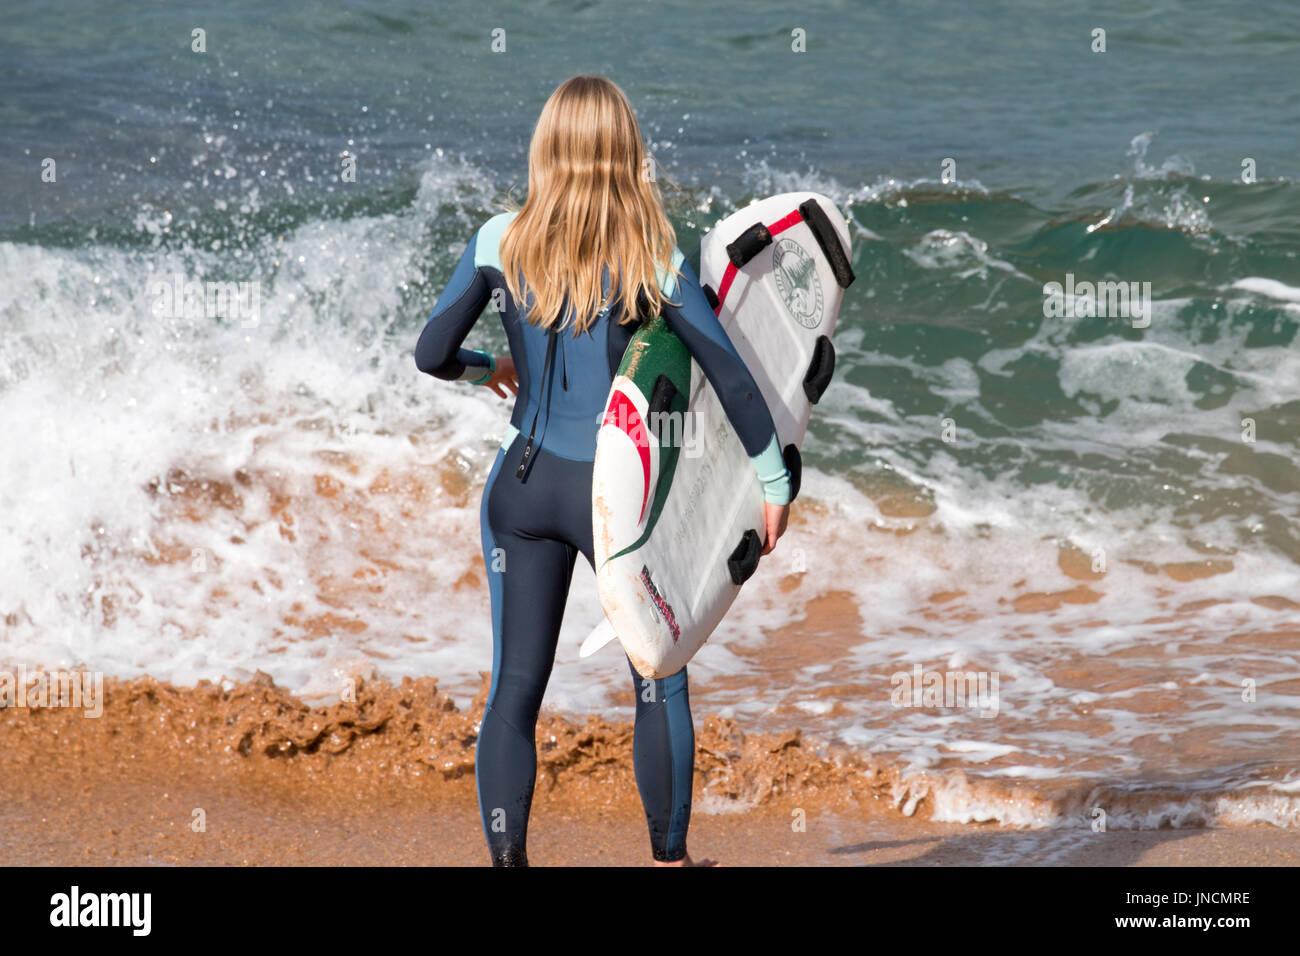 Rear view of blonde australian girl stood on a beach holding her surfboard,Sydney,Australia - Stock Image